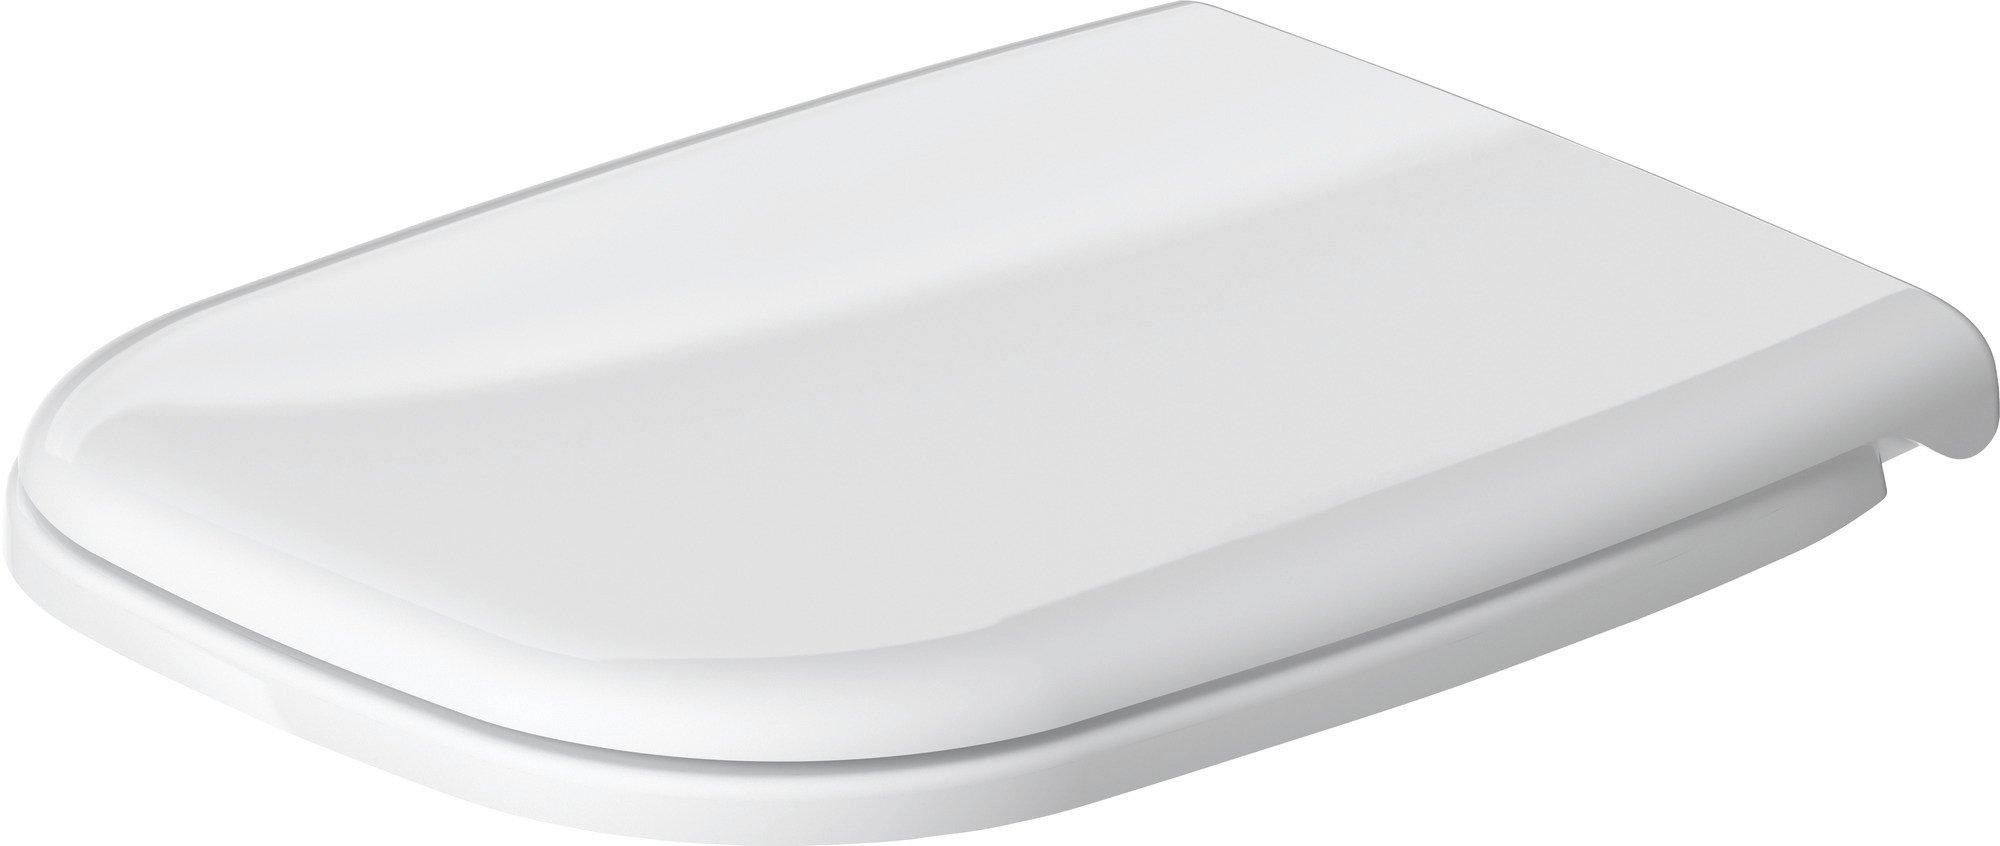 Duravit WC-Sitz D-Code Compact mit SoftClose